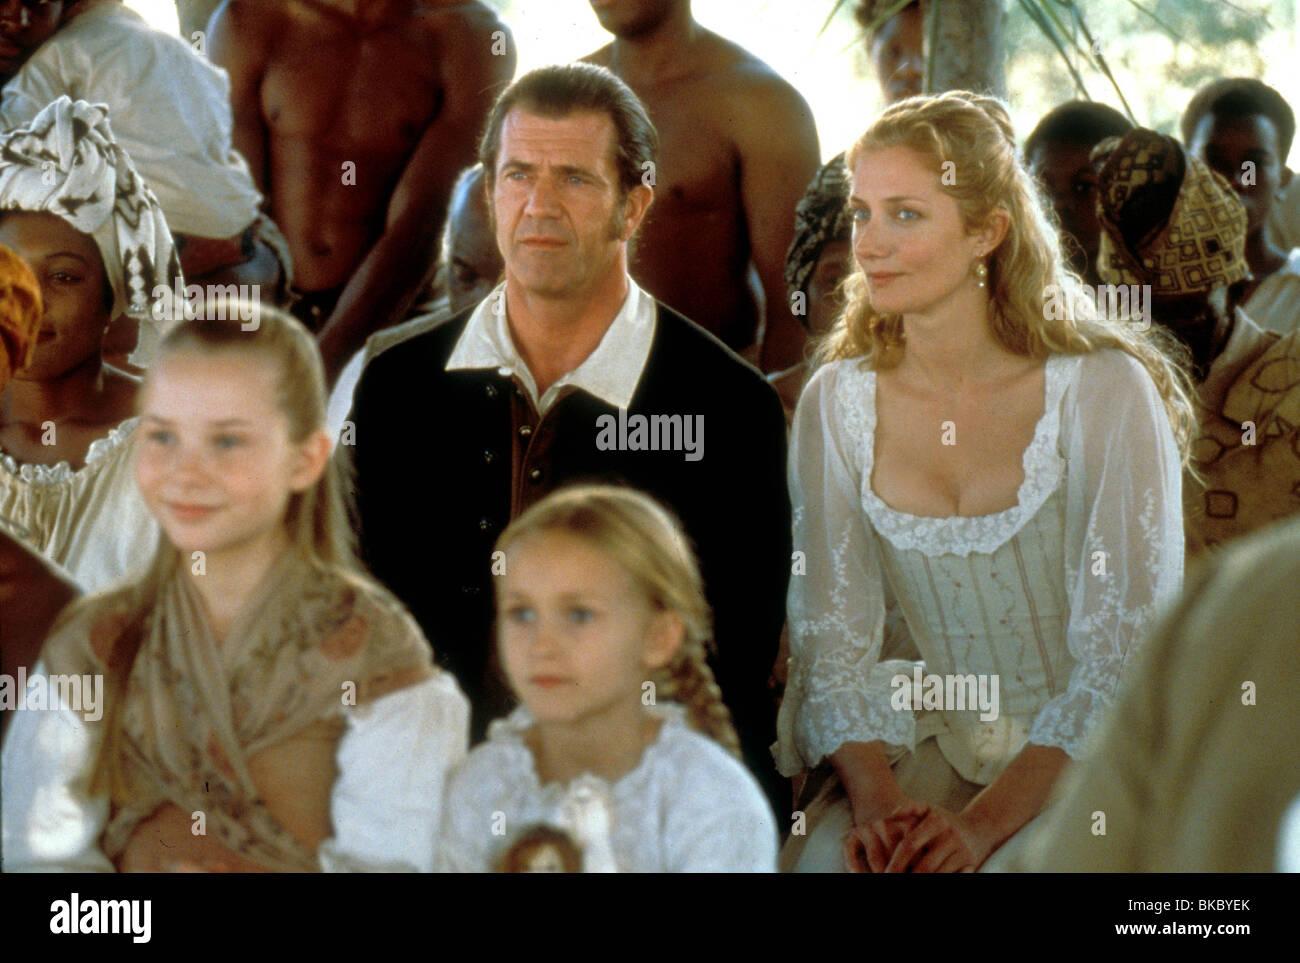 Joley richardson 2000 movie